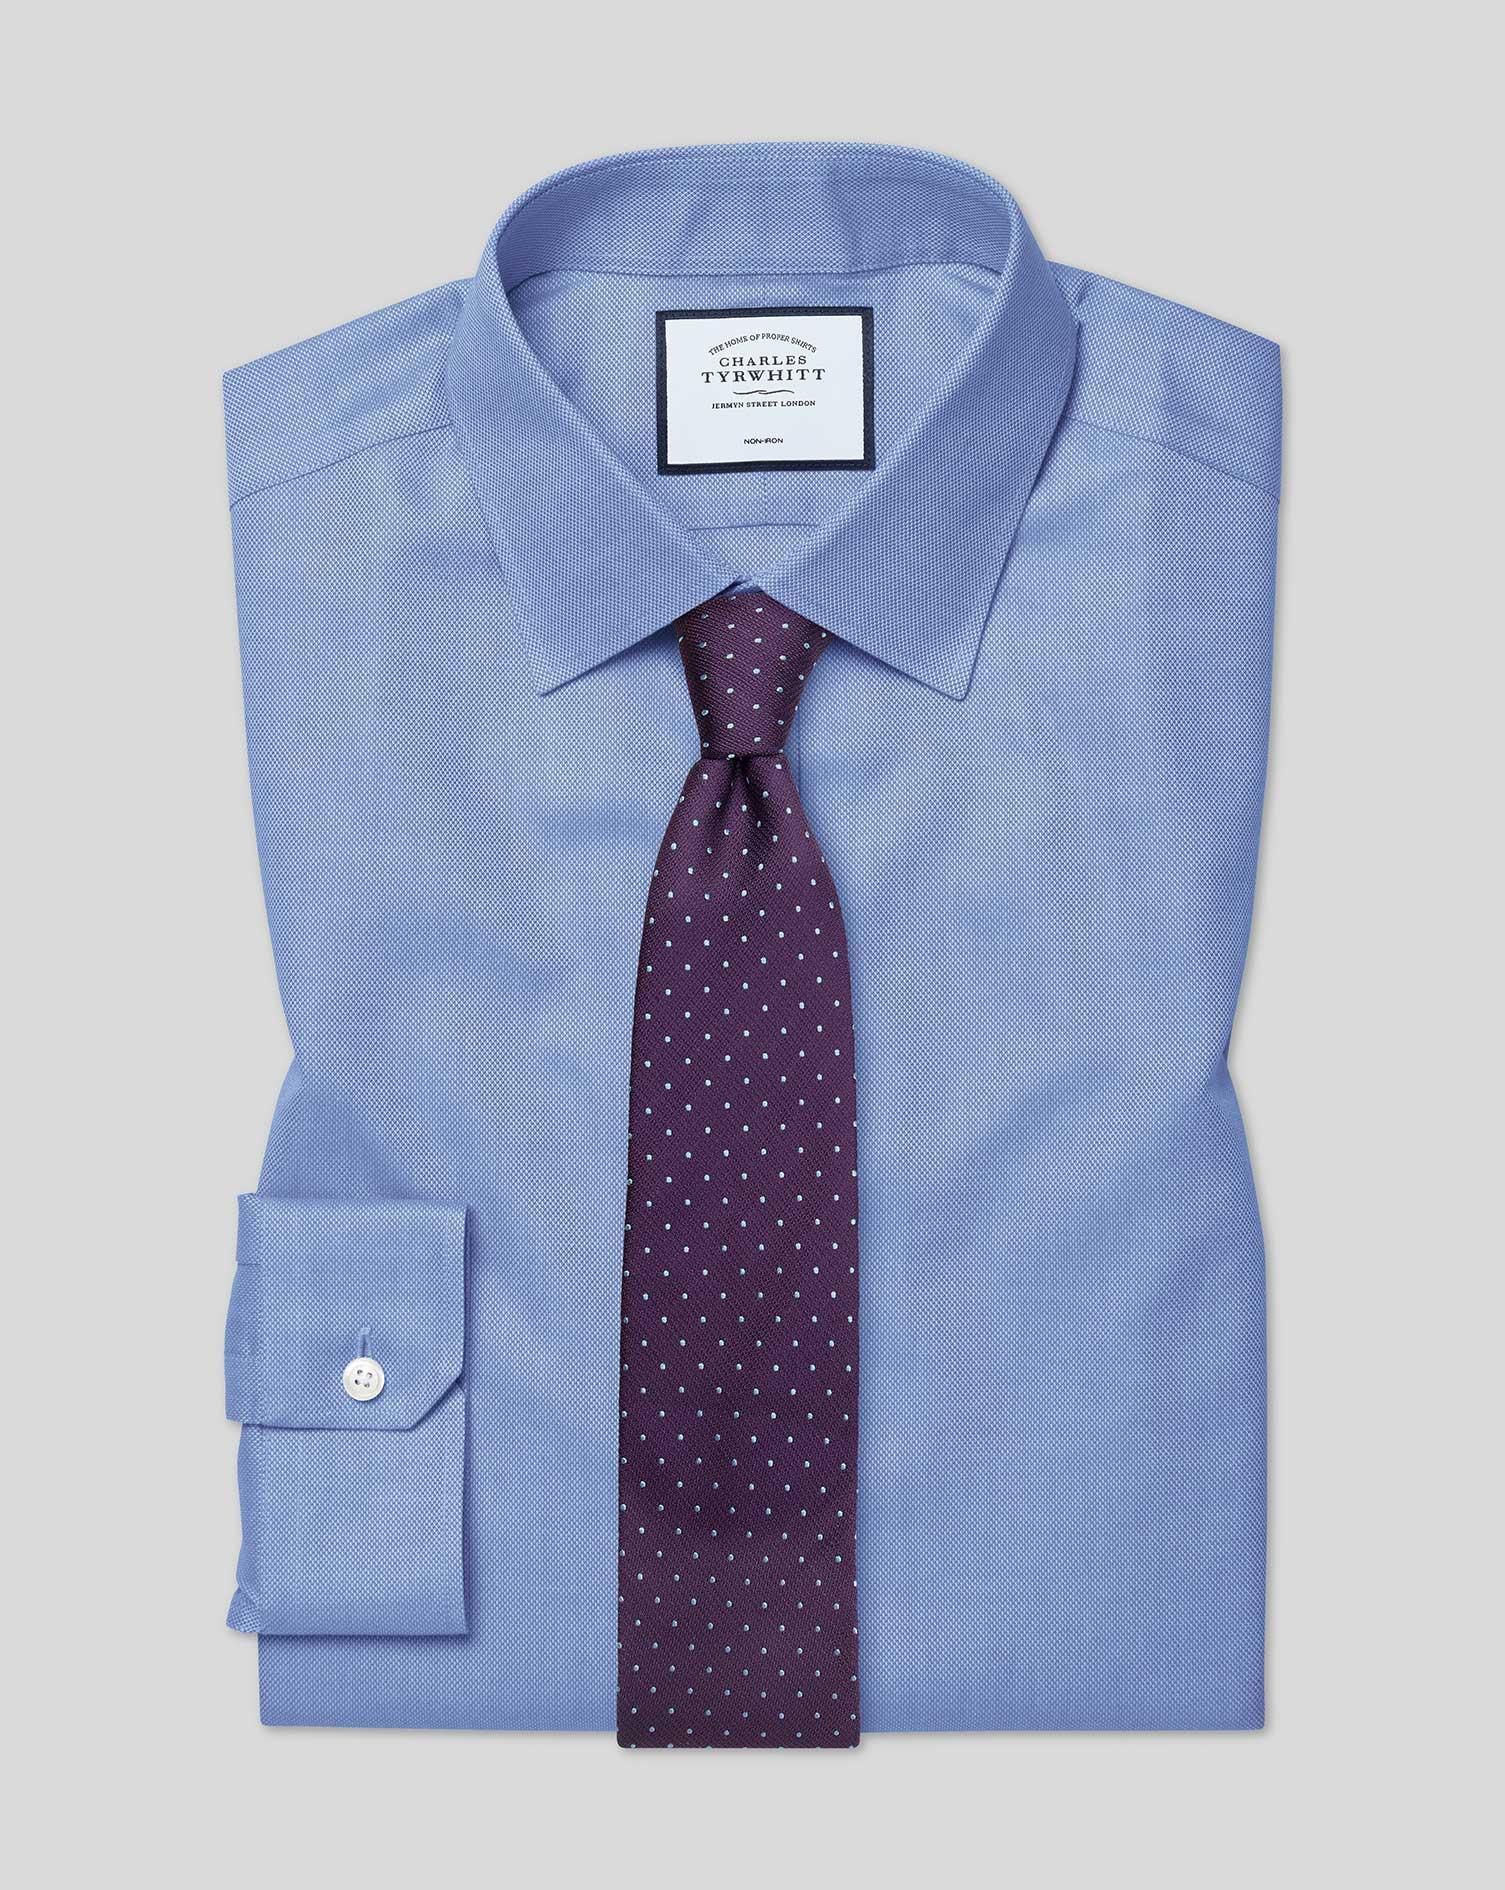 Cotton Super Slim Fit Non-Iron Royal Panama Blue Shirt